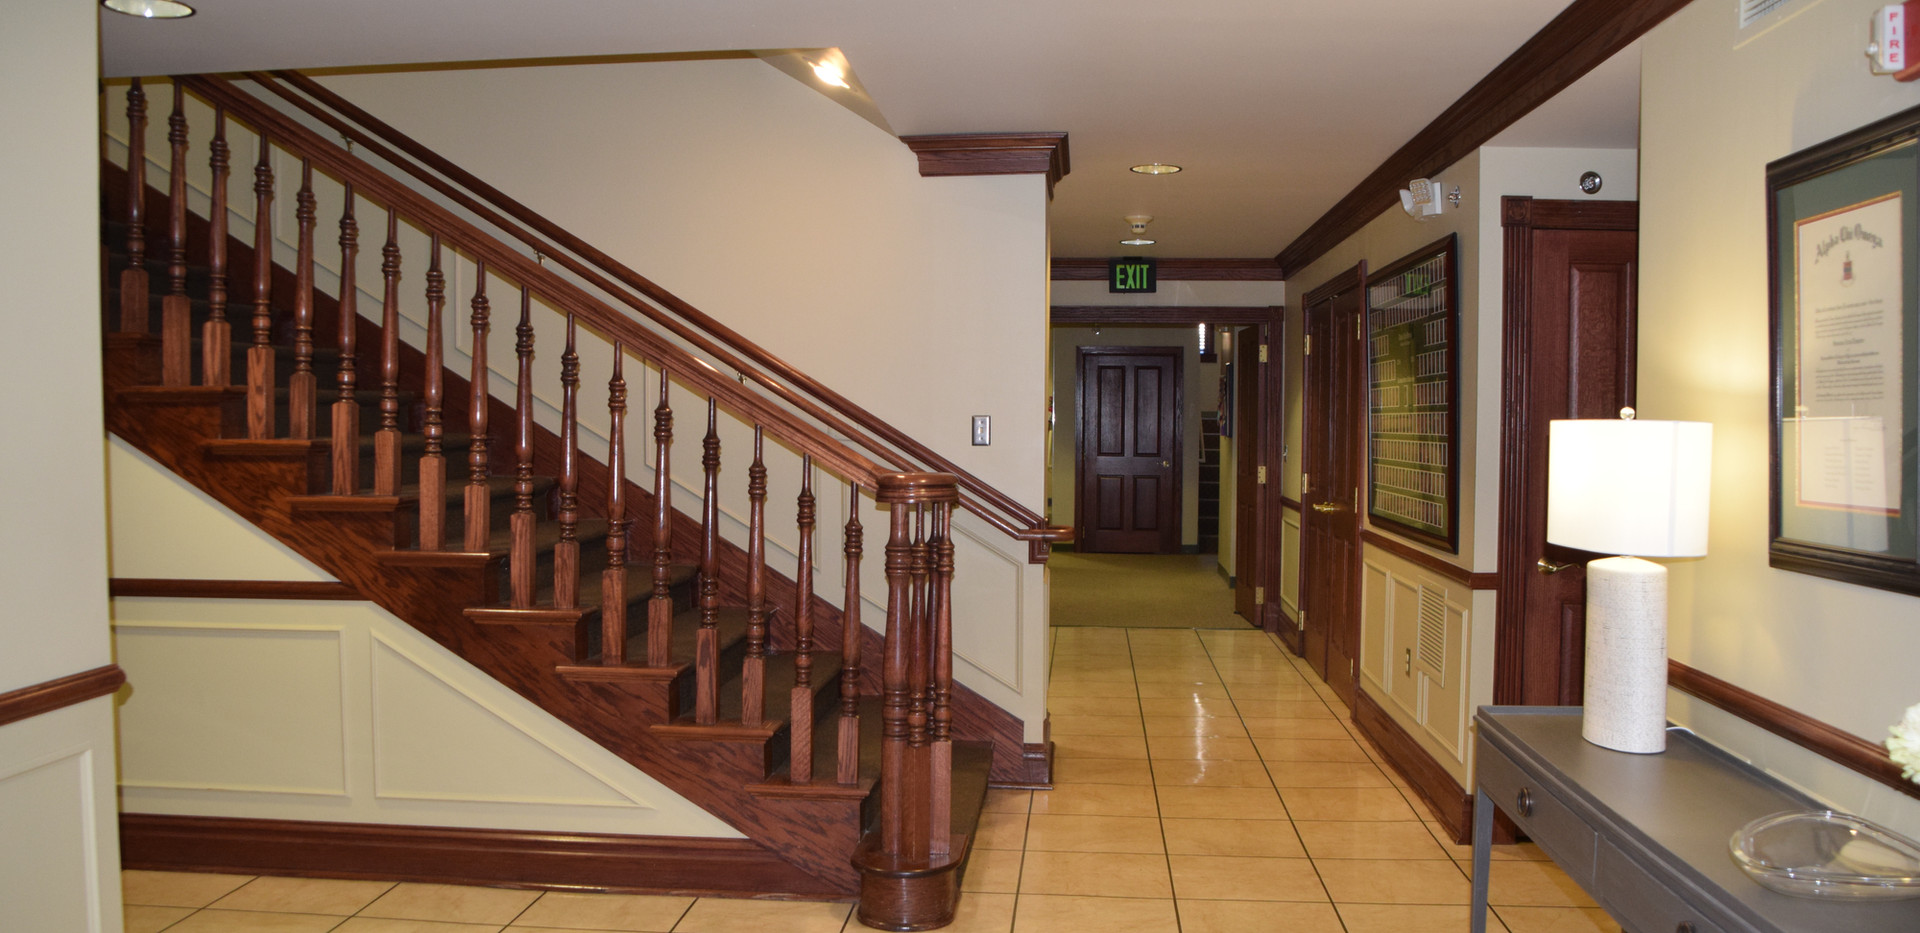 Main Staircase/Hallway